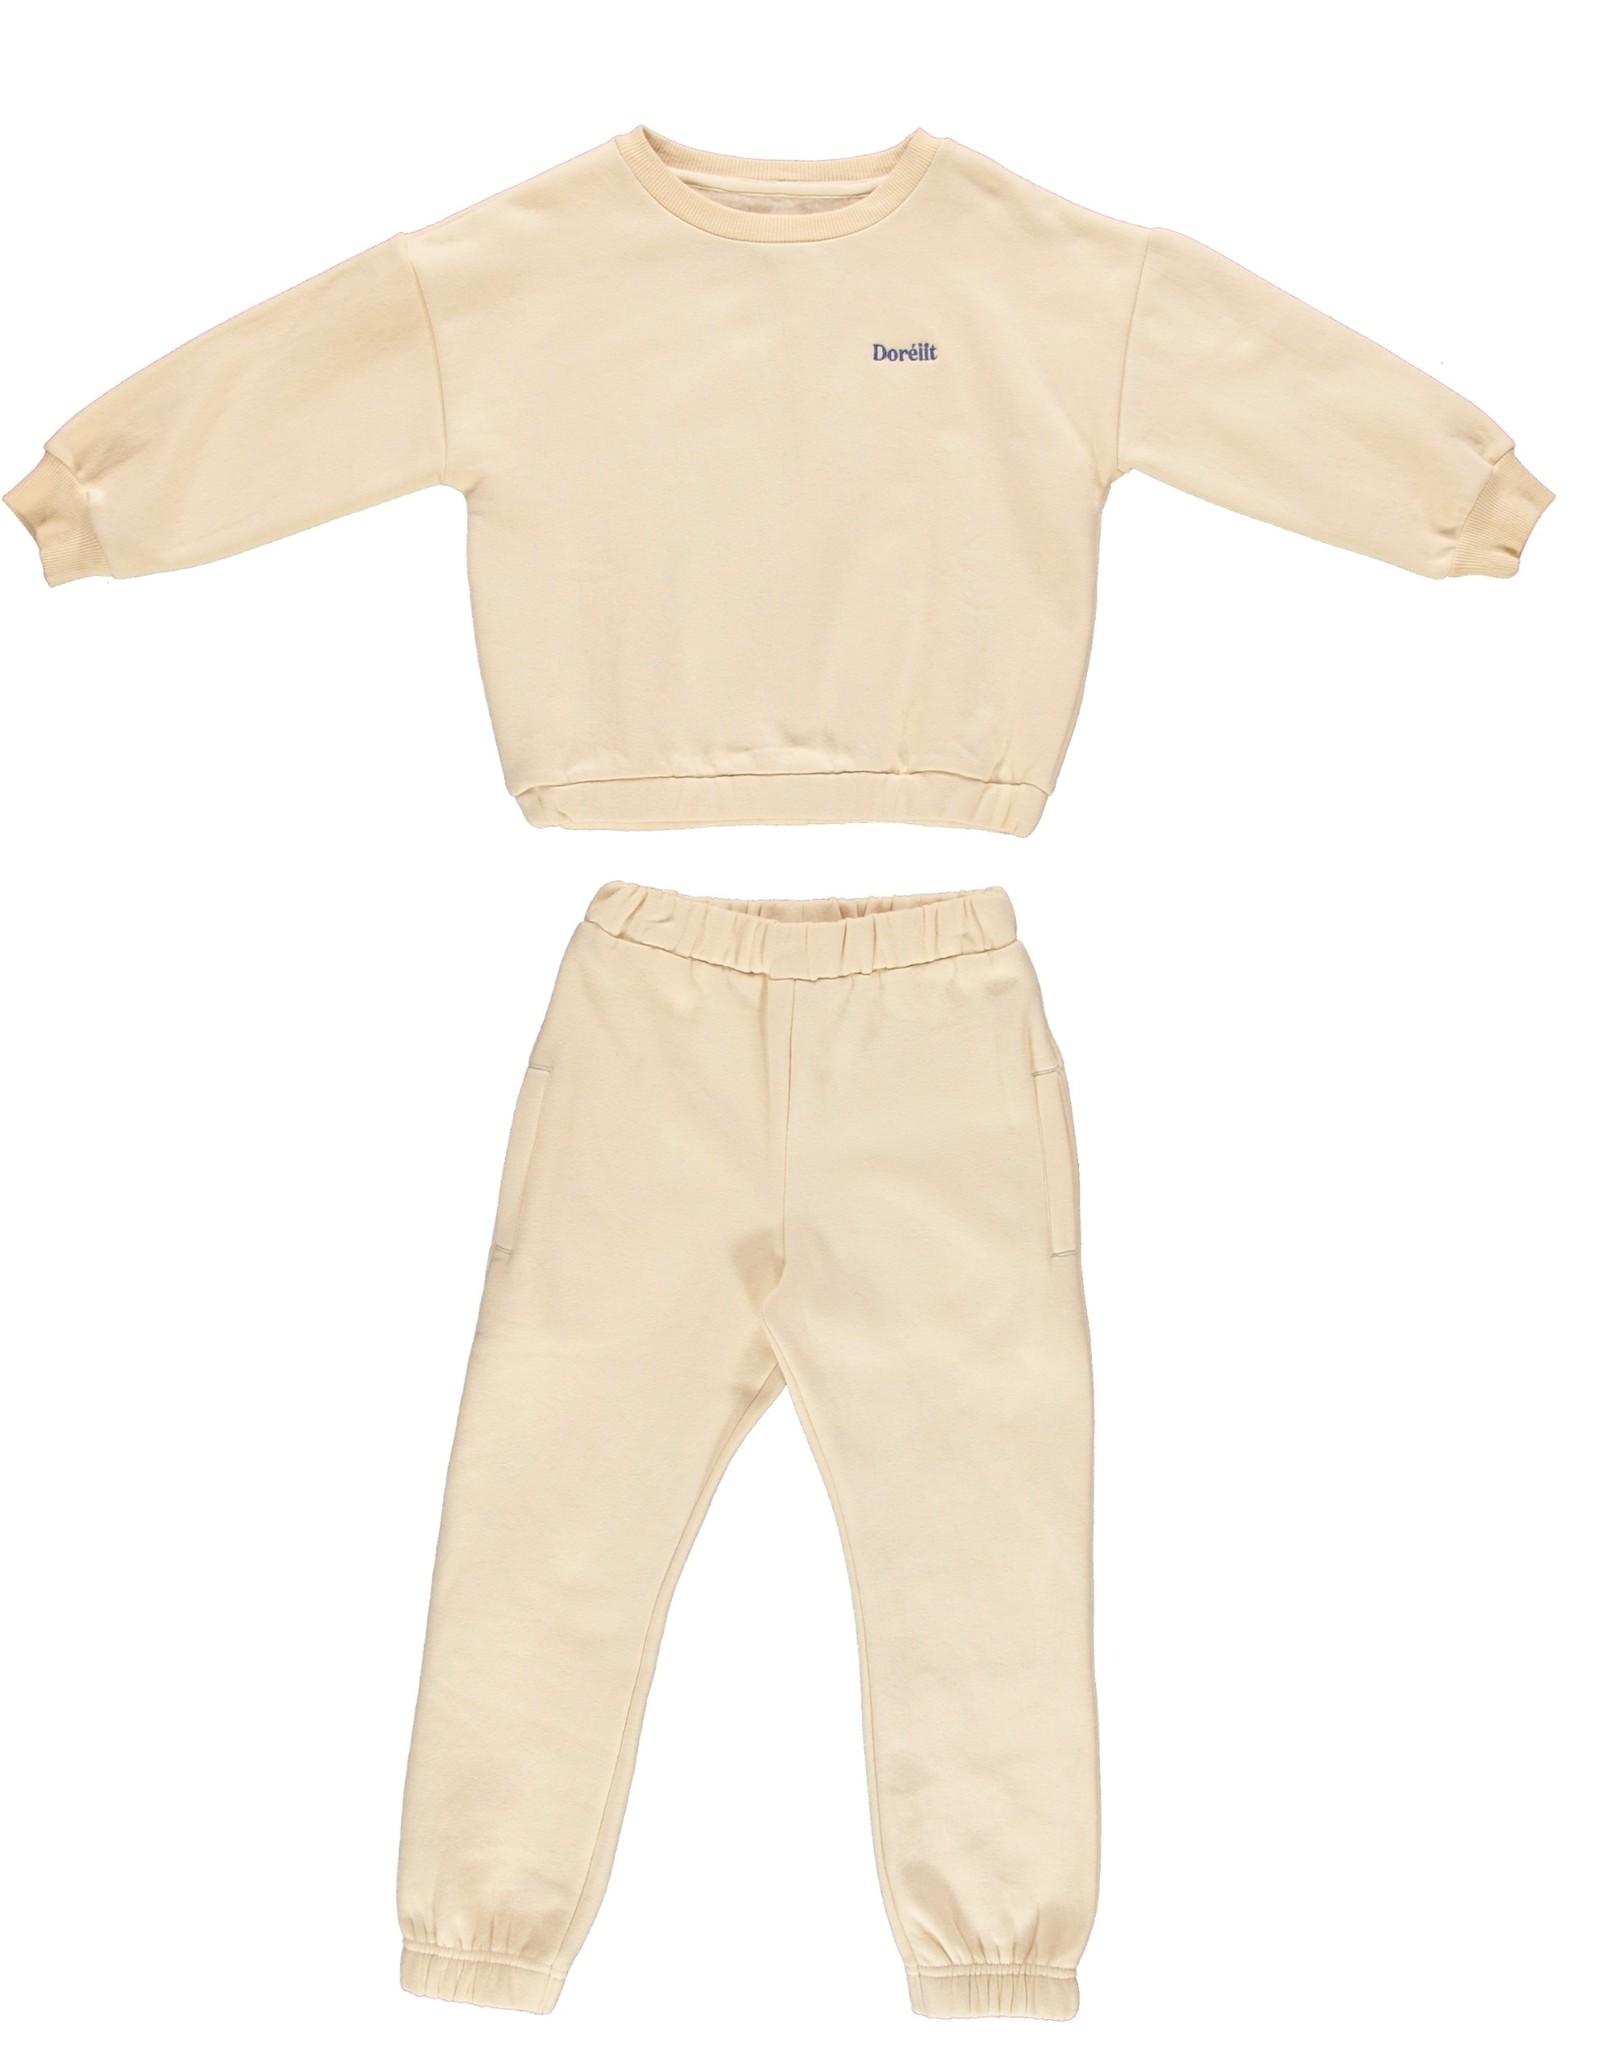 Dorélit Freya + Felix | Pajama Set Fleece | Offwhite